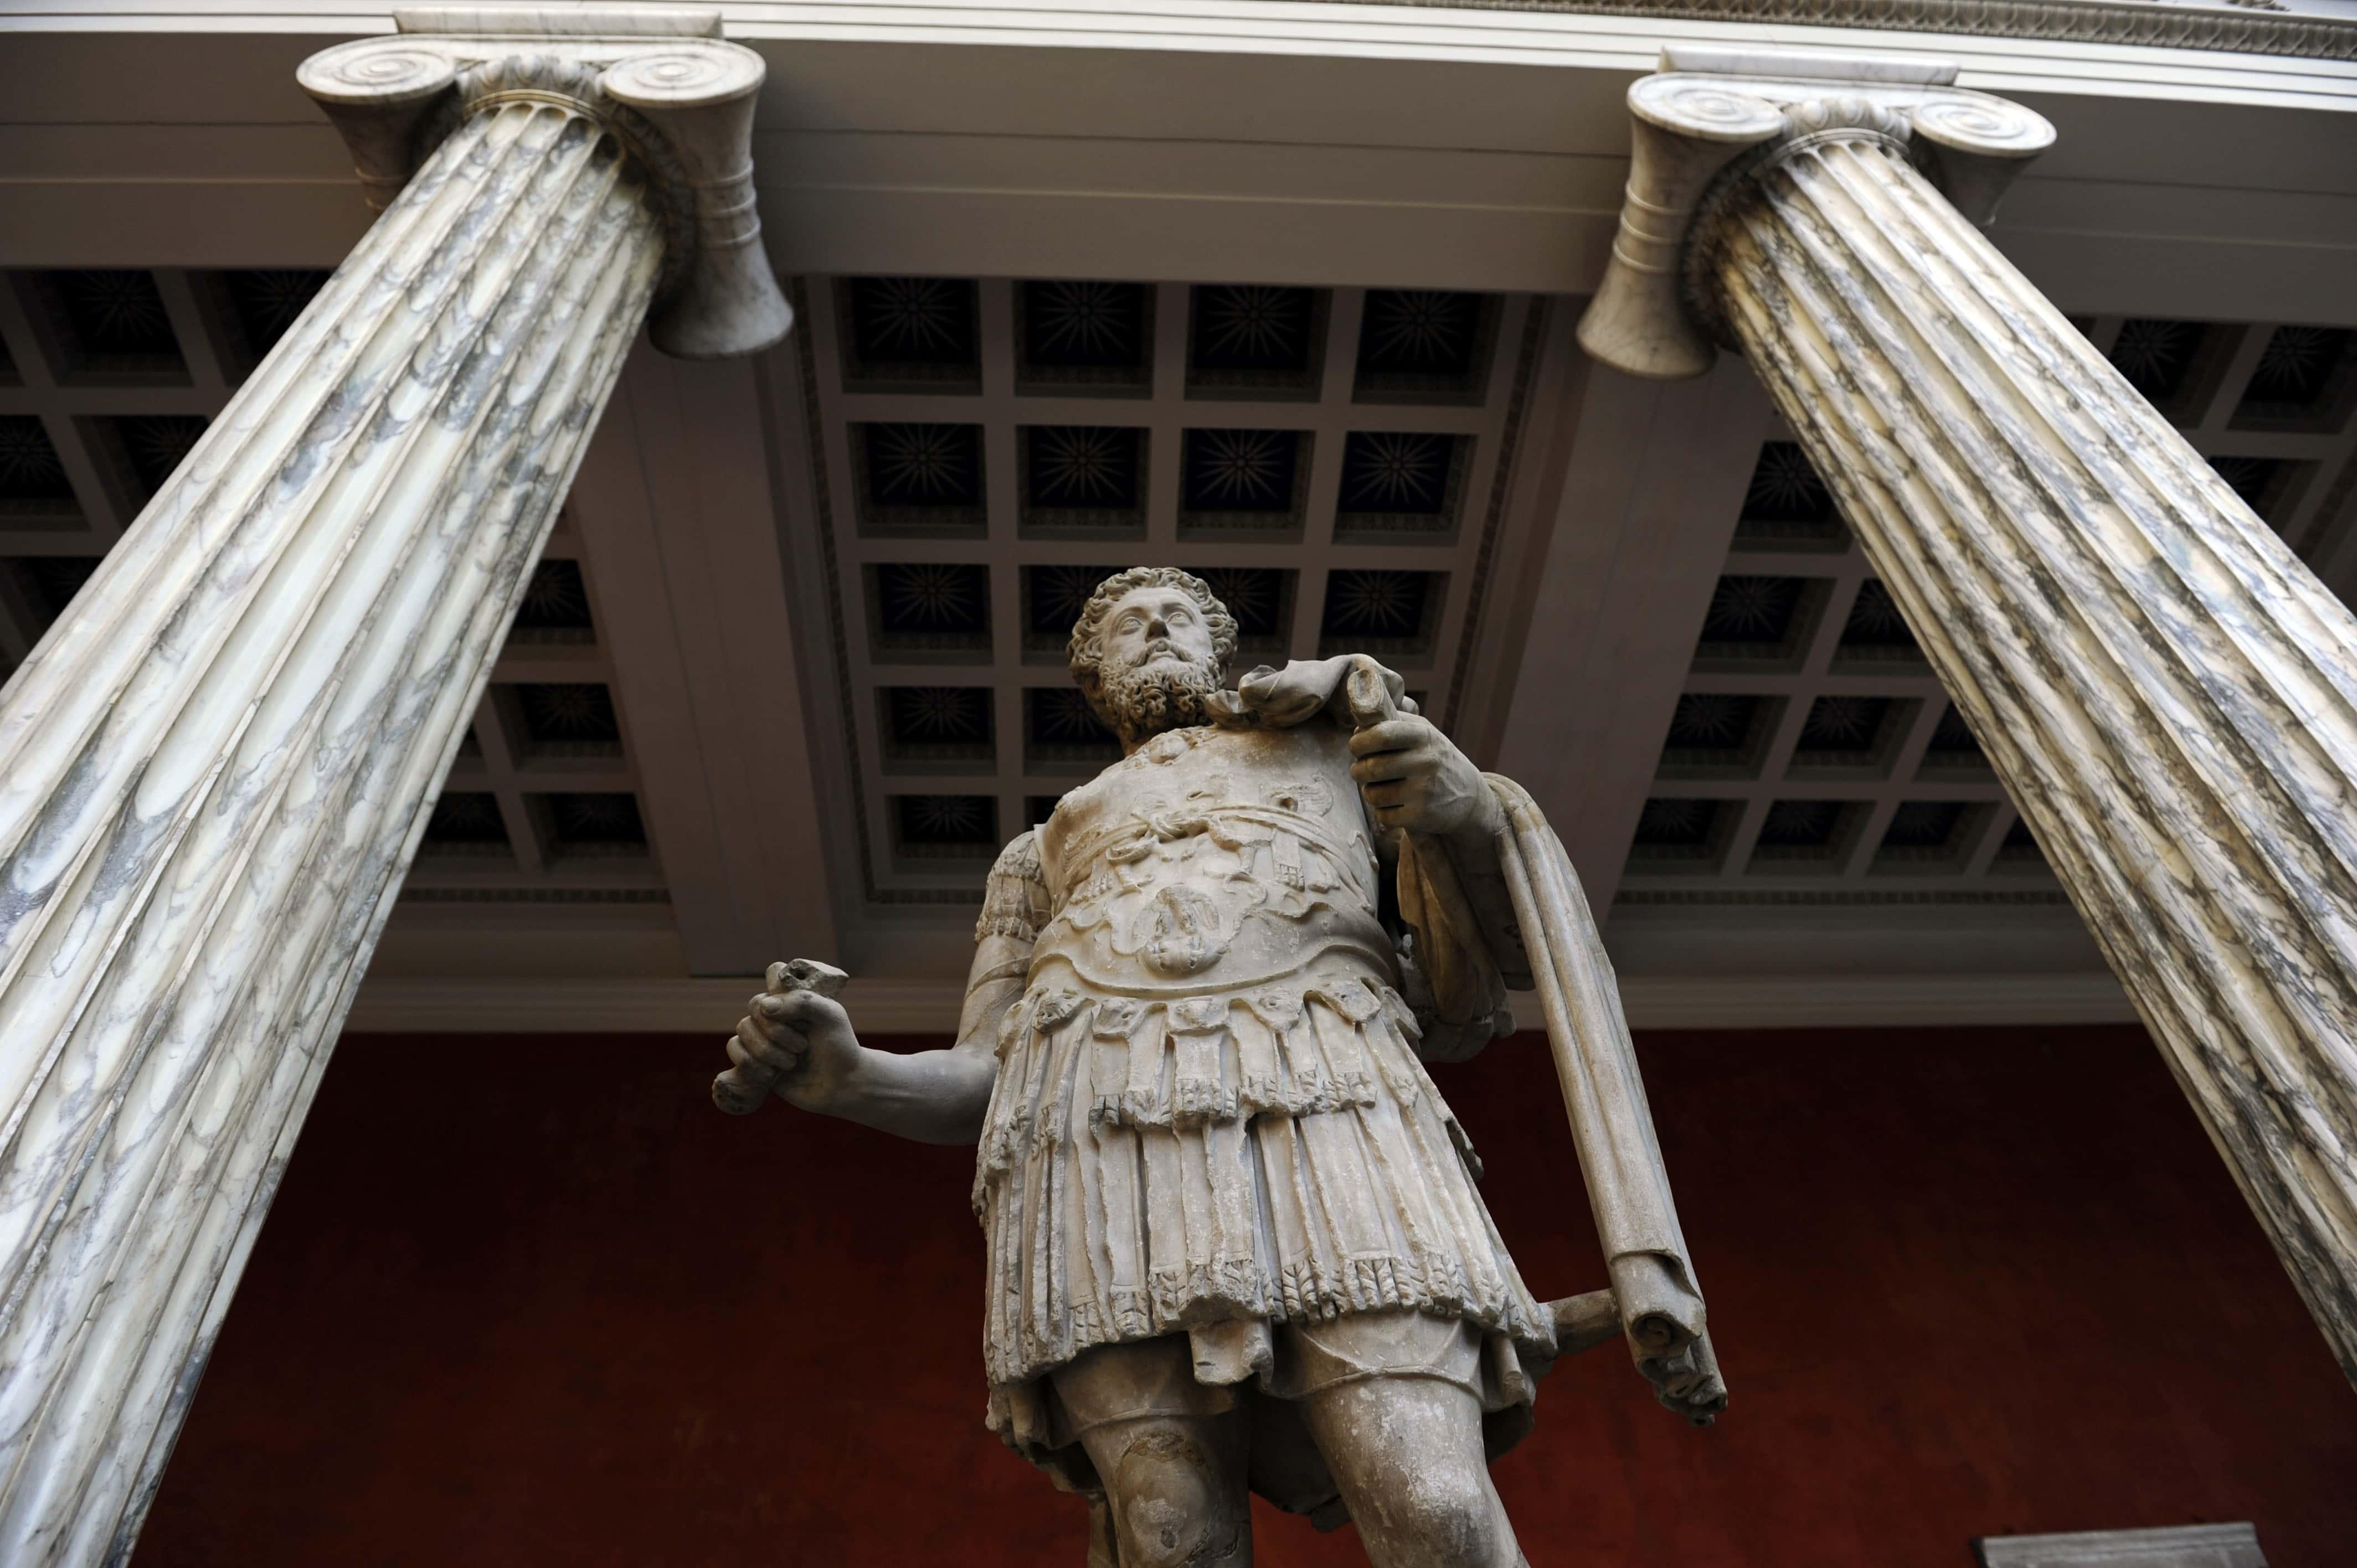 Marcus Aurelius (121-180). Roman emperor from 161 to 180. Ny Carlsberg Glyptotek. Denmark.